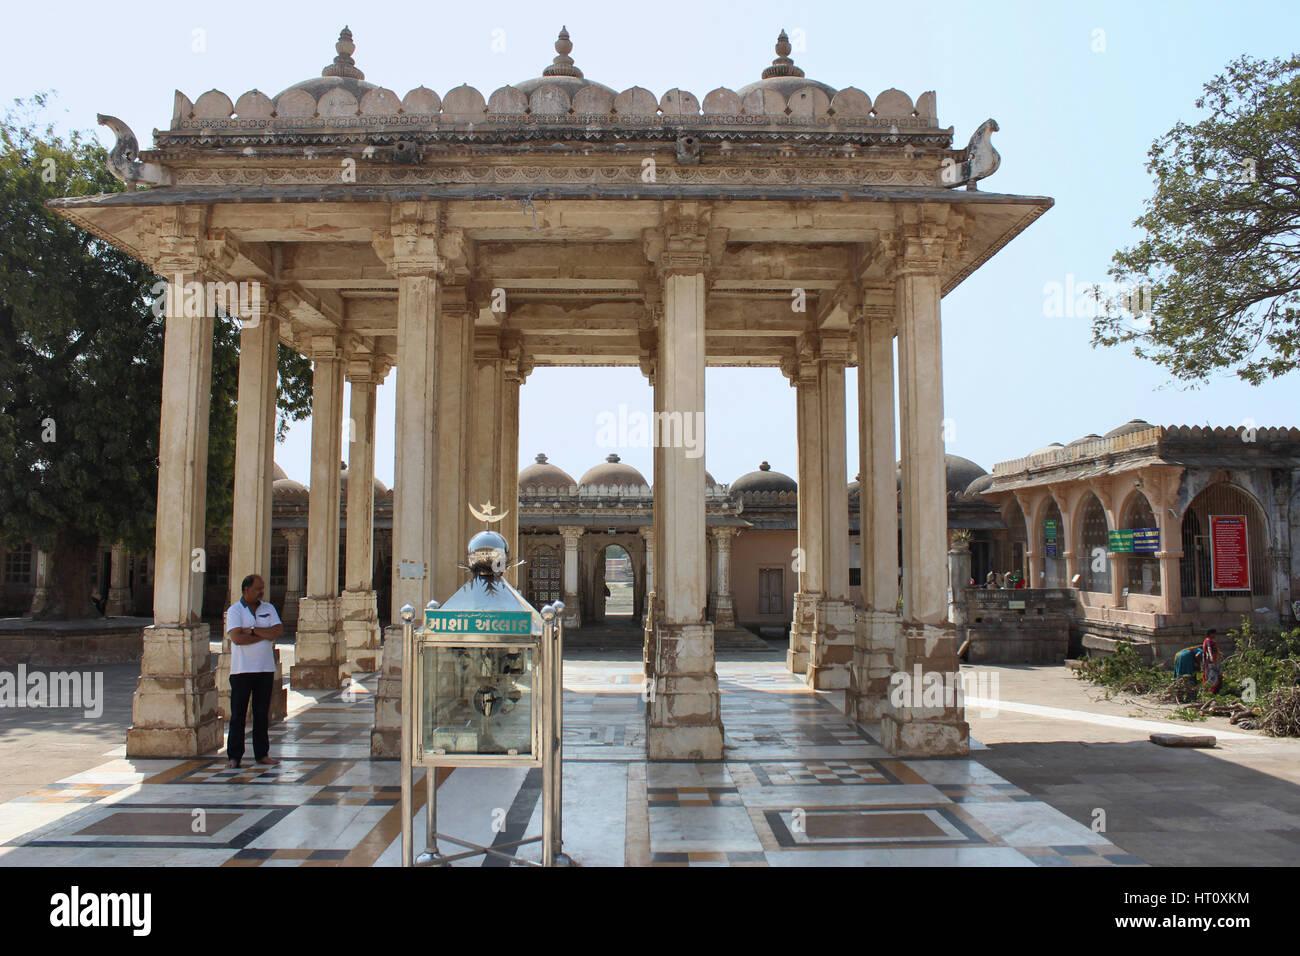 Sixteen-pillared structure known as the Baradari. Sarkhej Roza, Ahmedabad, Gujarat India. Baradari stands in front - Stock Image